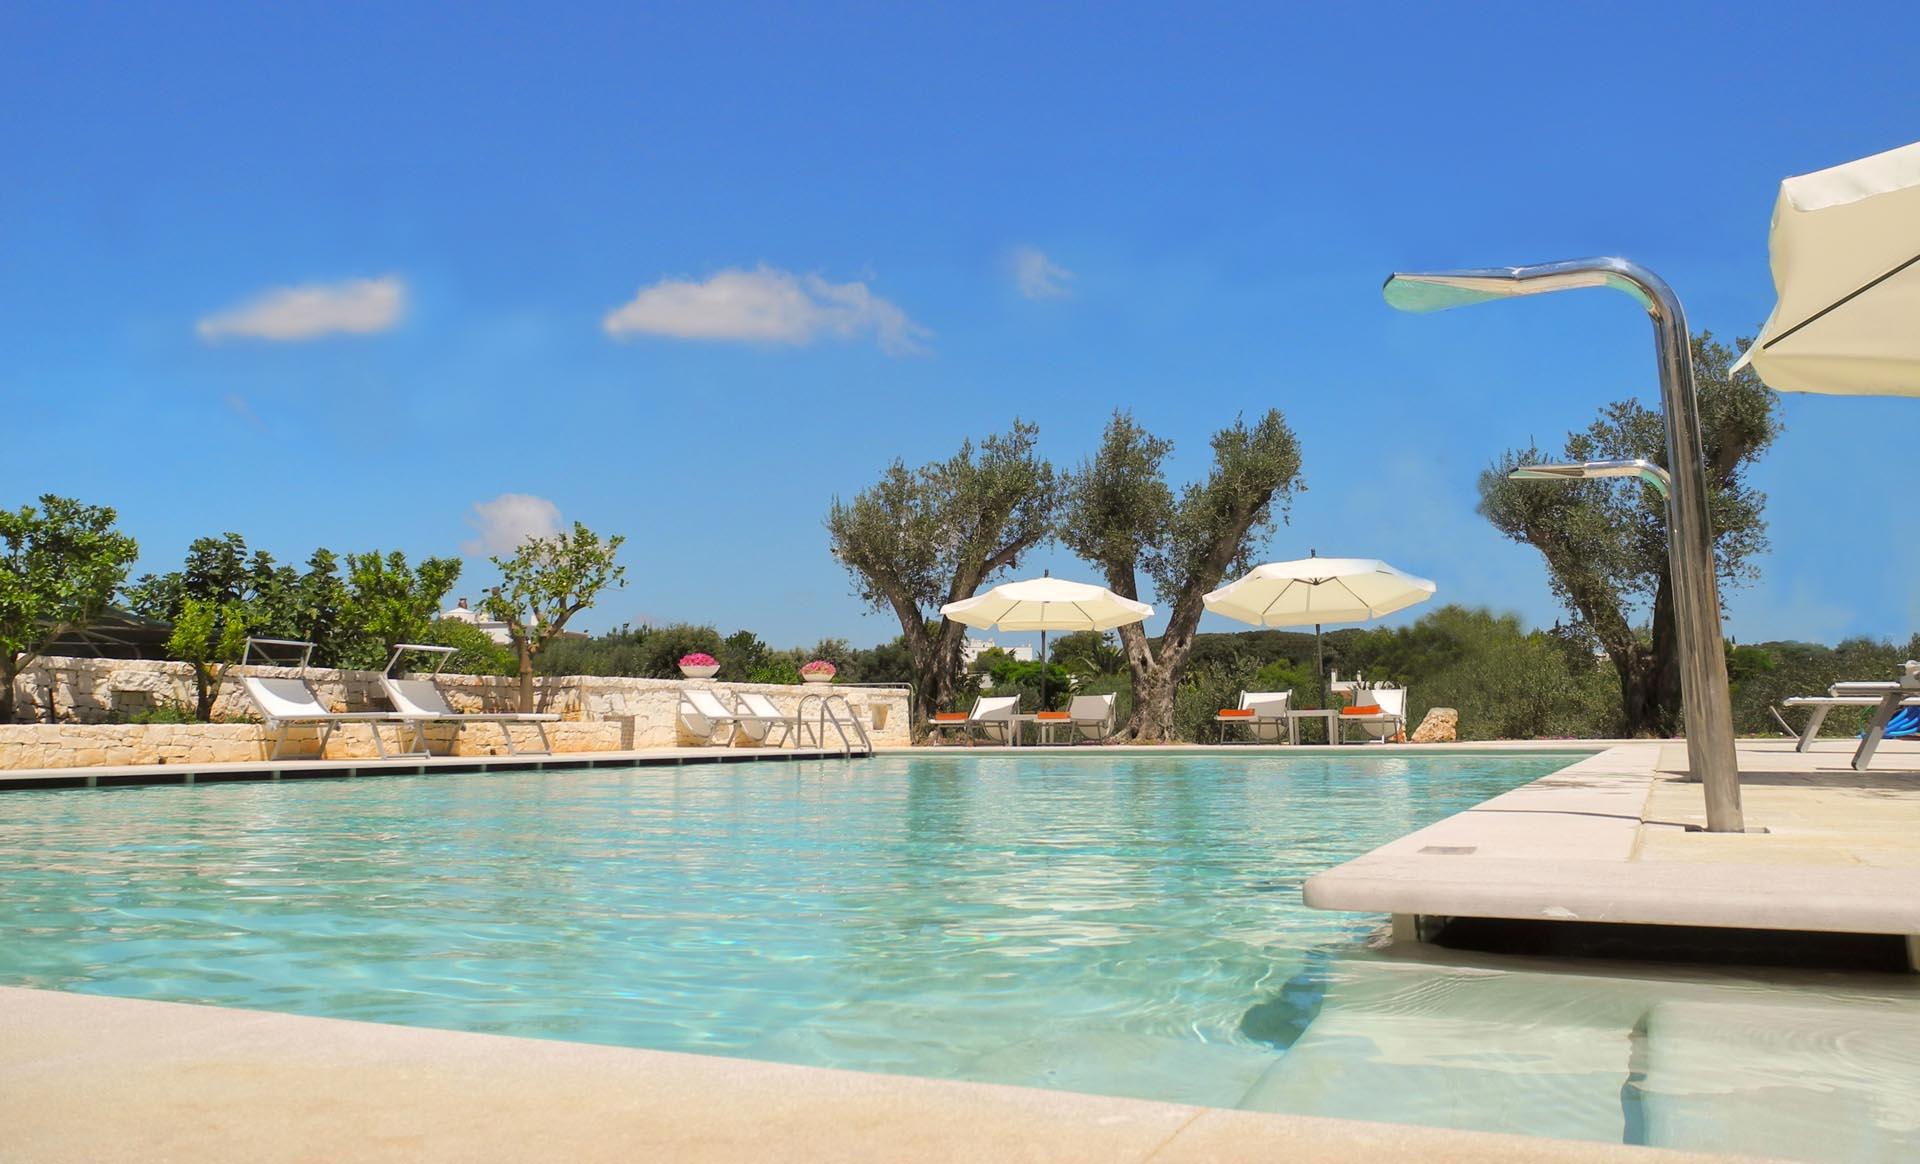 Agriturismo masseria con piscina in puglia ostuni - Masseria in puglia con piscina ...